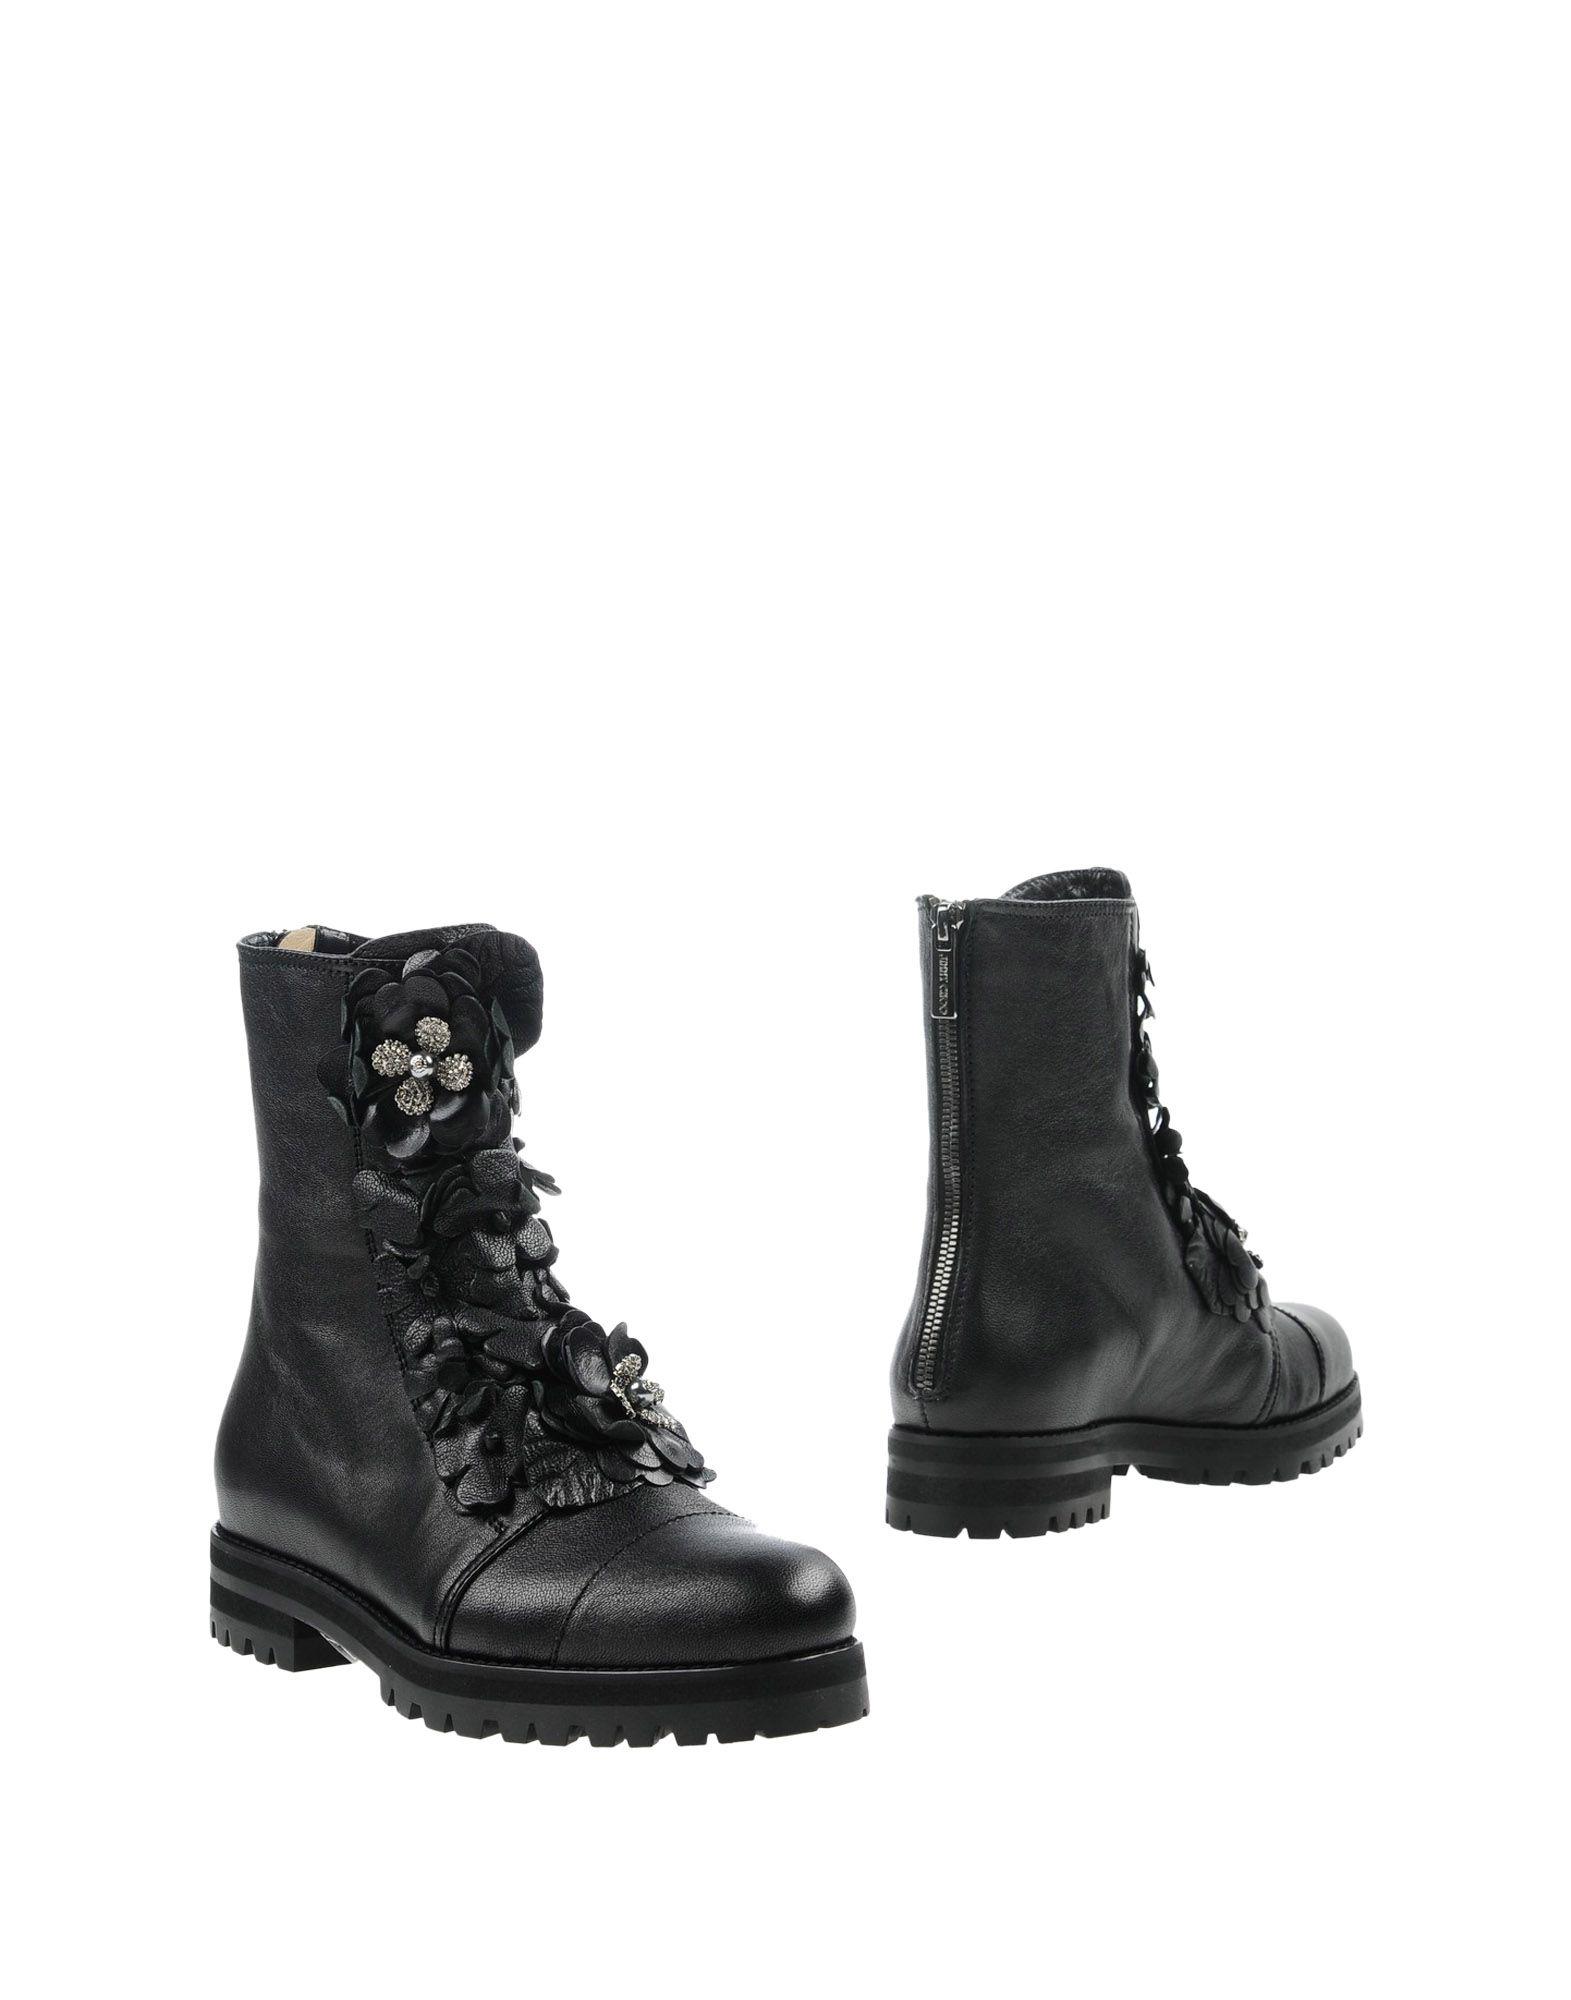 Jimmy Choo Schuhe Stiefelette Damen  11397271BRGünstige gut aussehende Schuhe Choo 2697b0